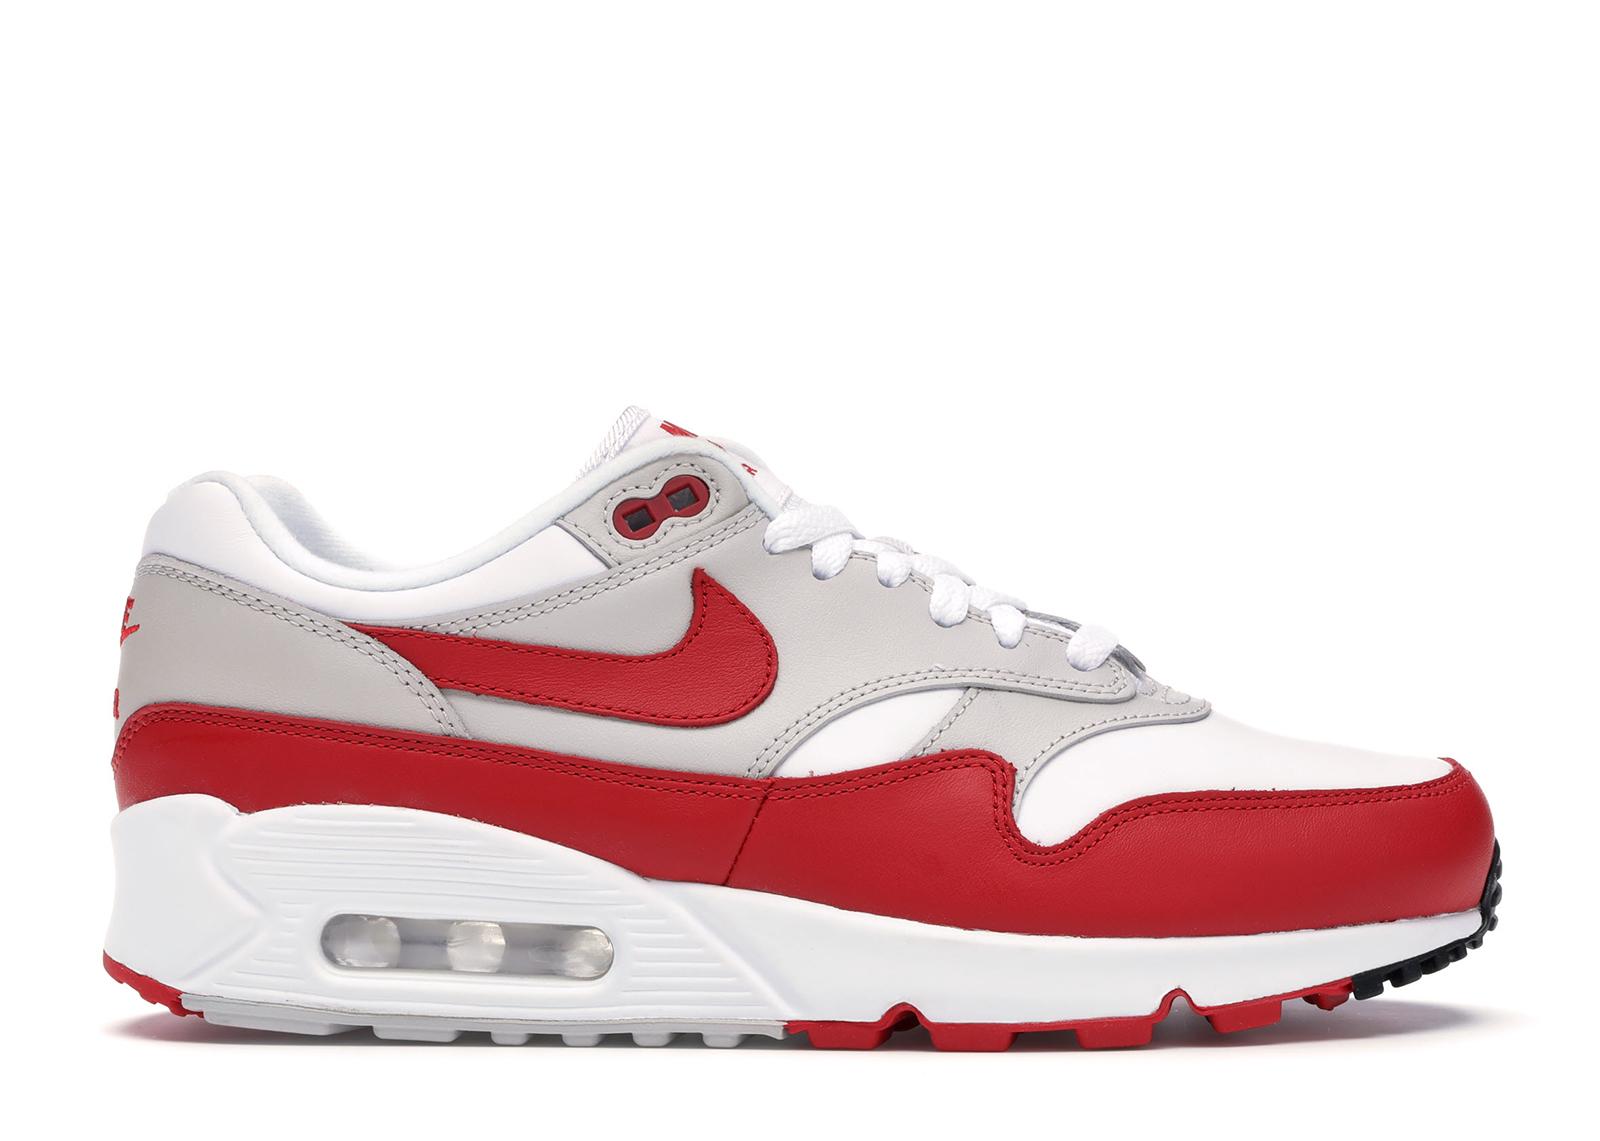 Nike Air Max 90/1 White University Red (W)